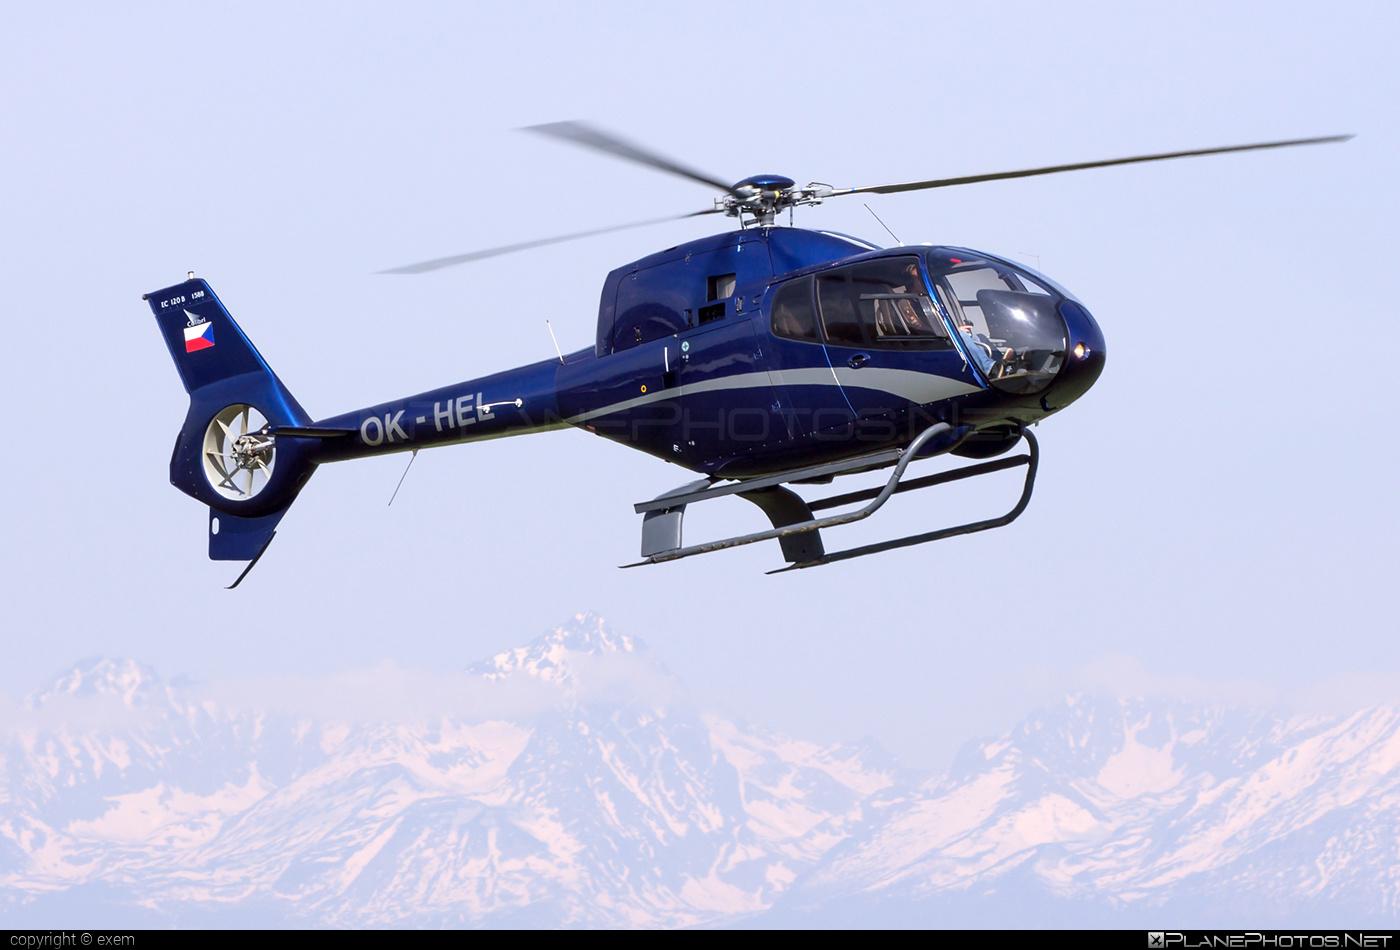 Eurocopter EC120 B Colibri - OK-HEL operated by Private operator #ec120 #ec120b #ec120bcolibri #ec120colibri #eurocopter #eurocoptercolibri #eurocopterec120colibri